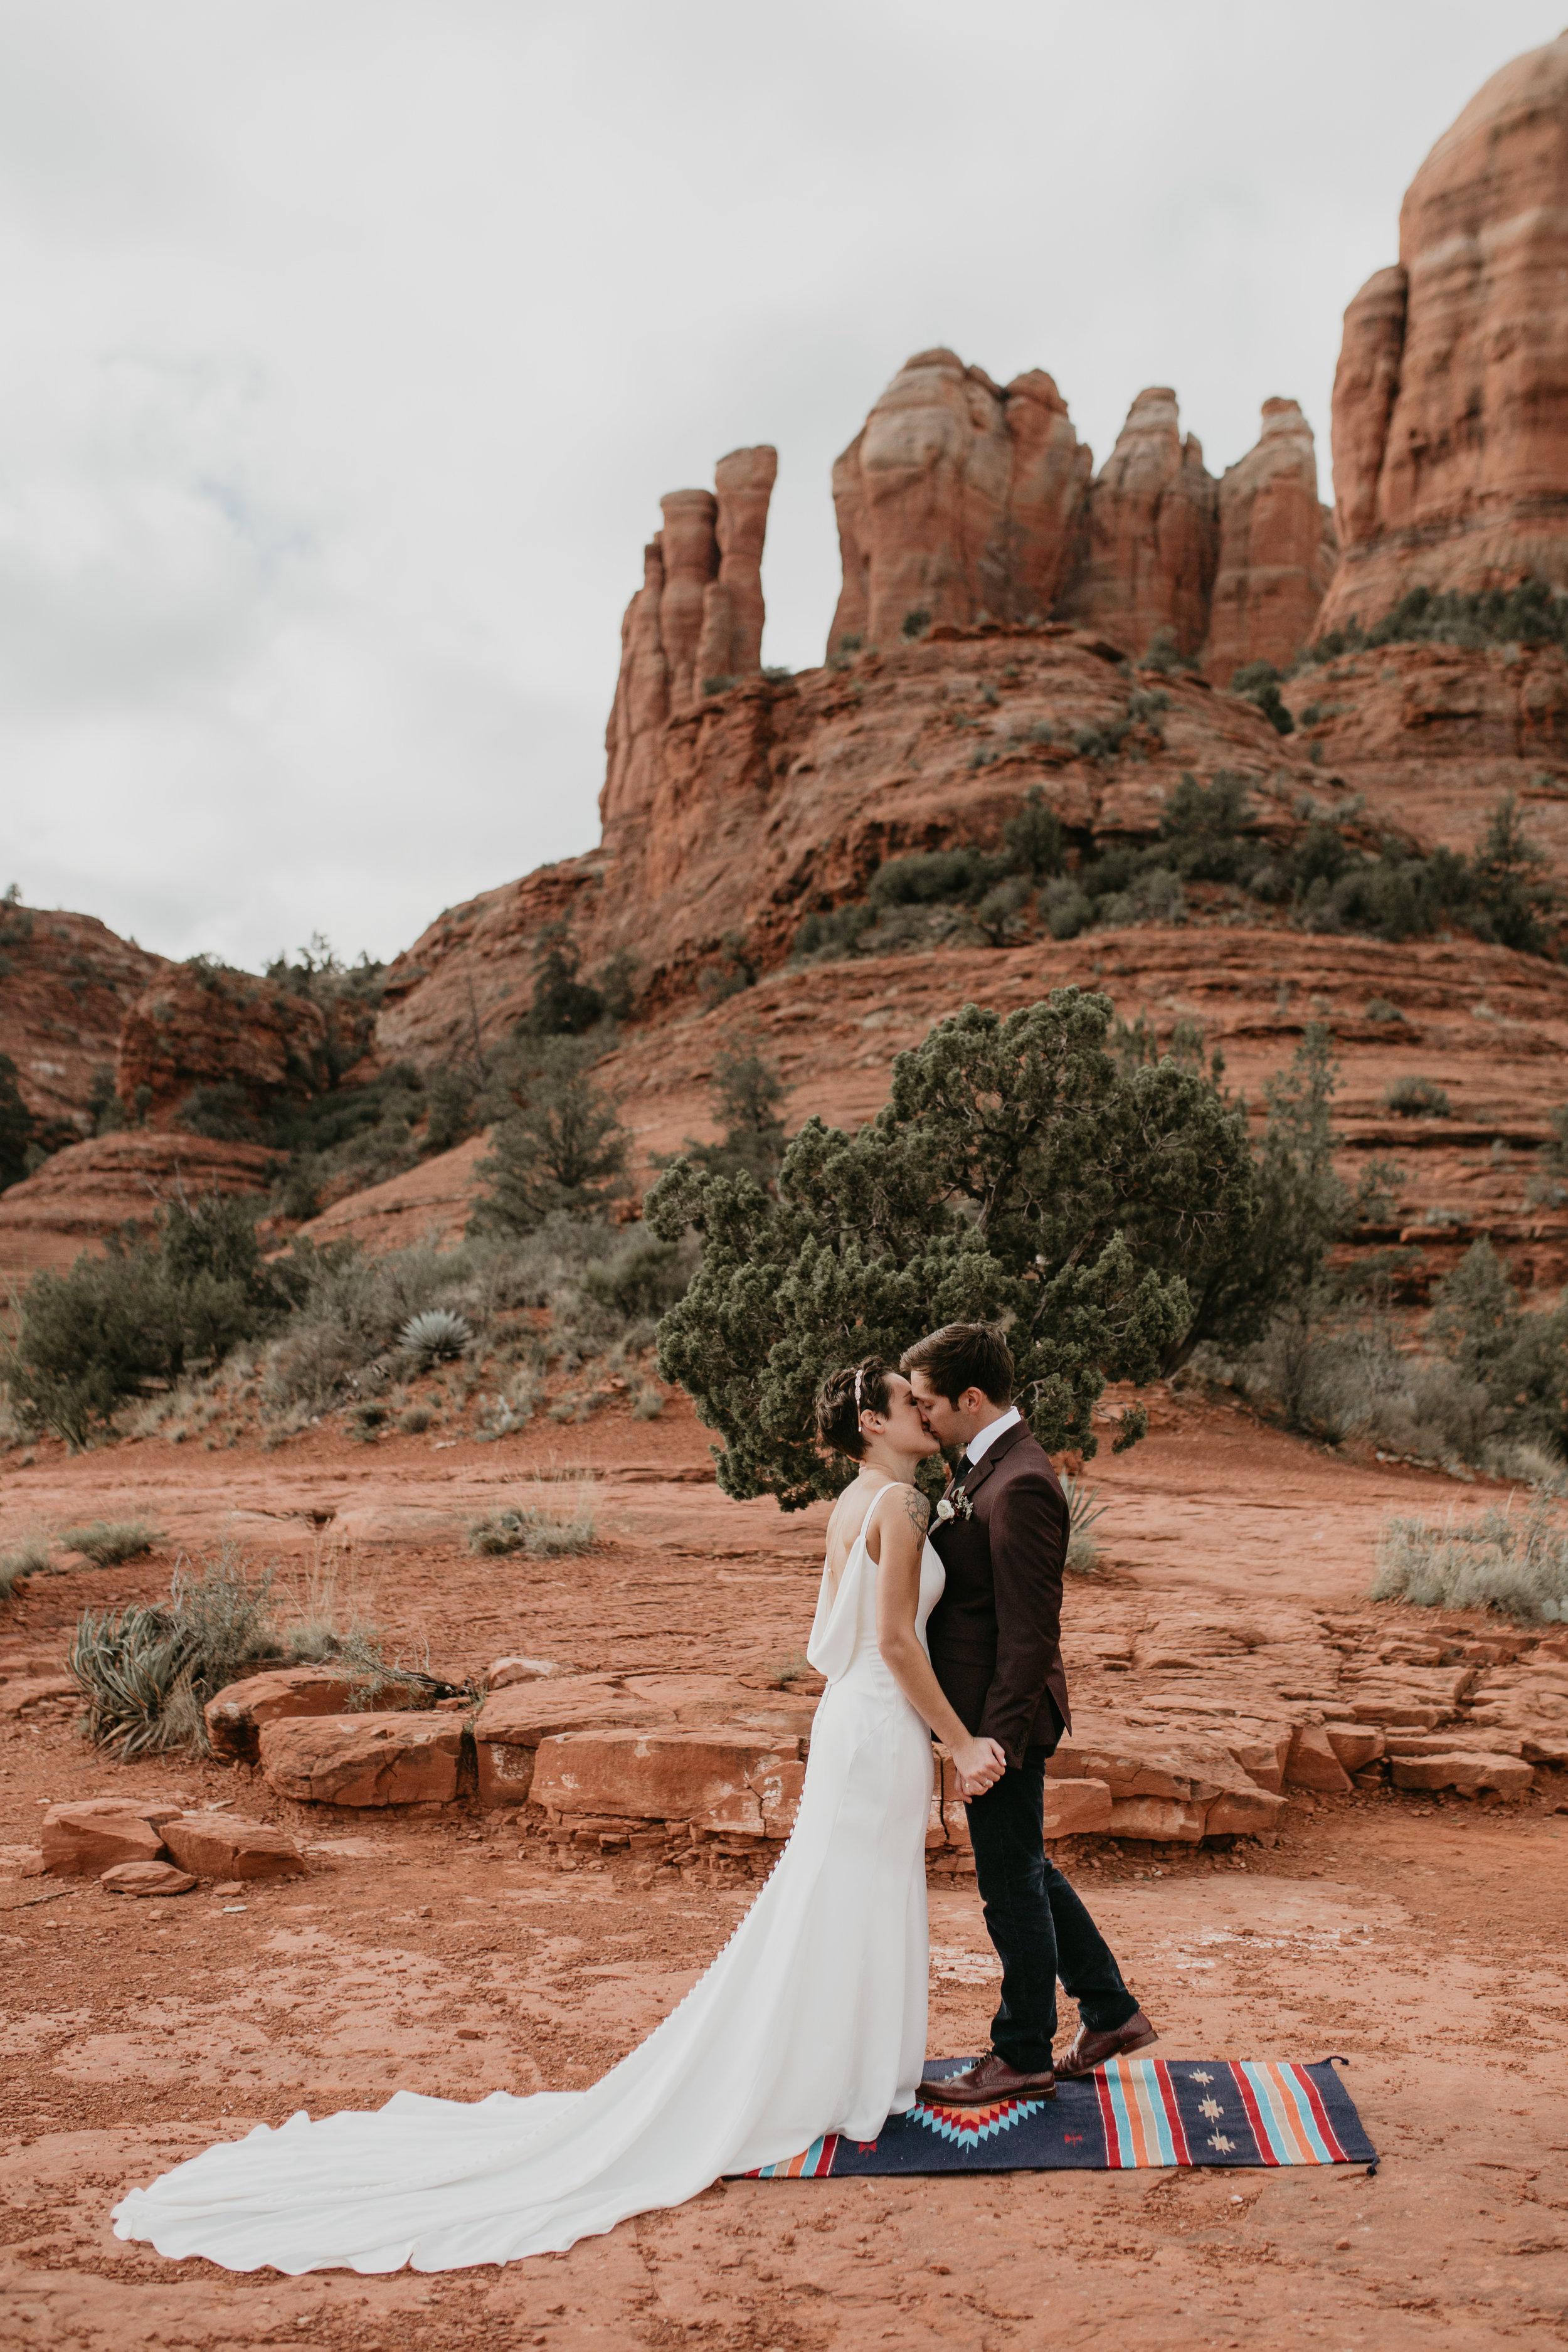 nicole-daacke-photography-sedona-arizona-destination-elopement-wedding-photographer-catherdral-rock-hiking-elopement-sedona-river-elopement-photos-desert-rock-wedding-photographer-laid-back-spontaneous-elopement-87.jpg